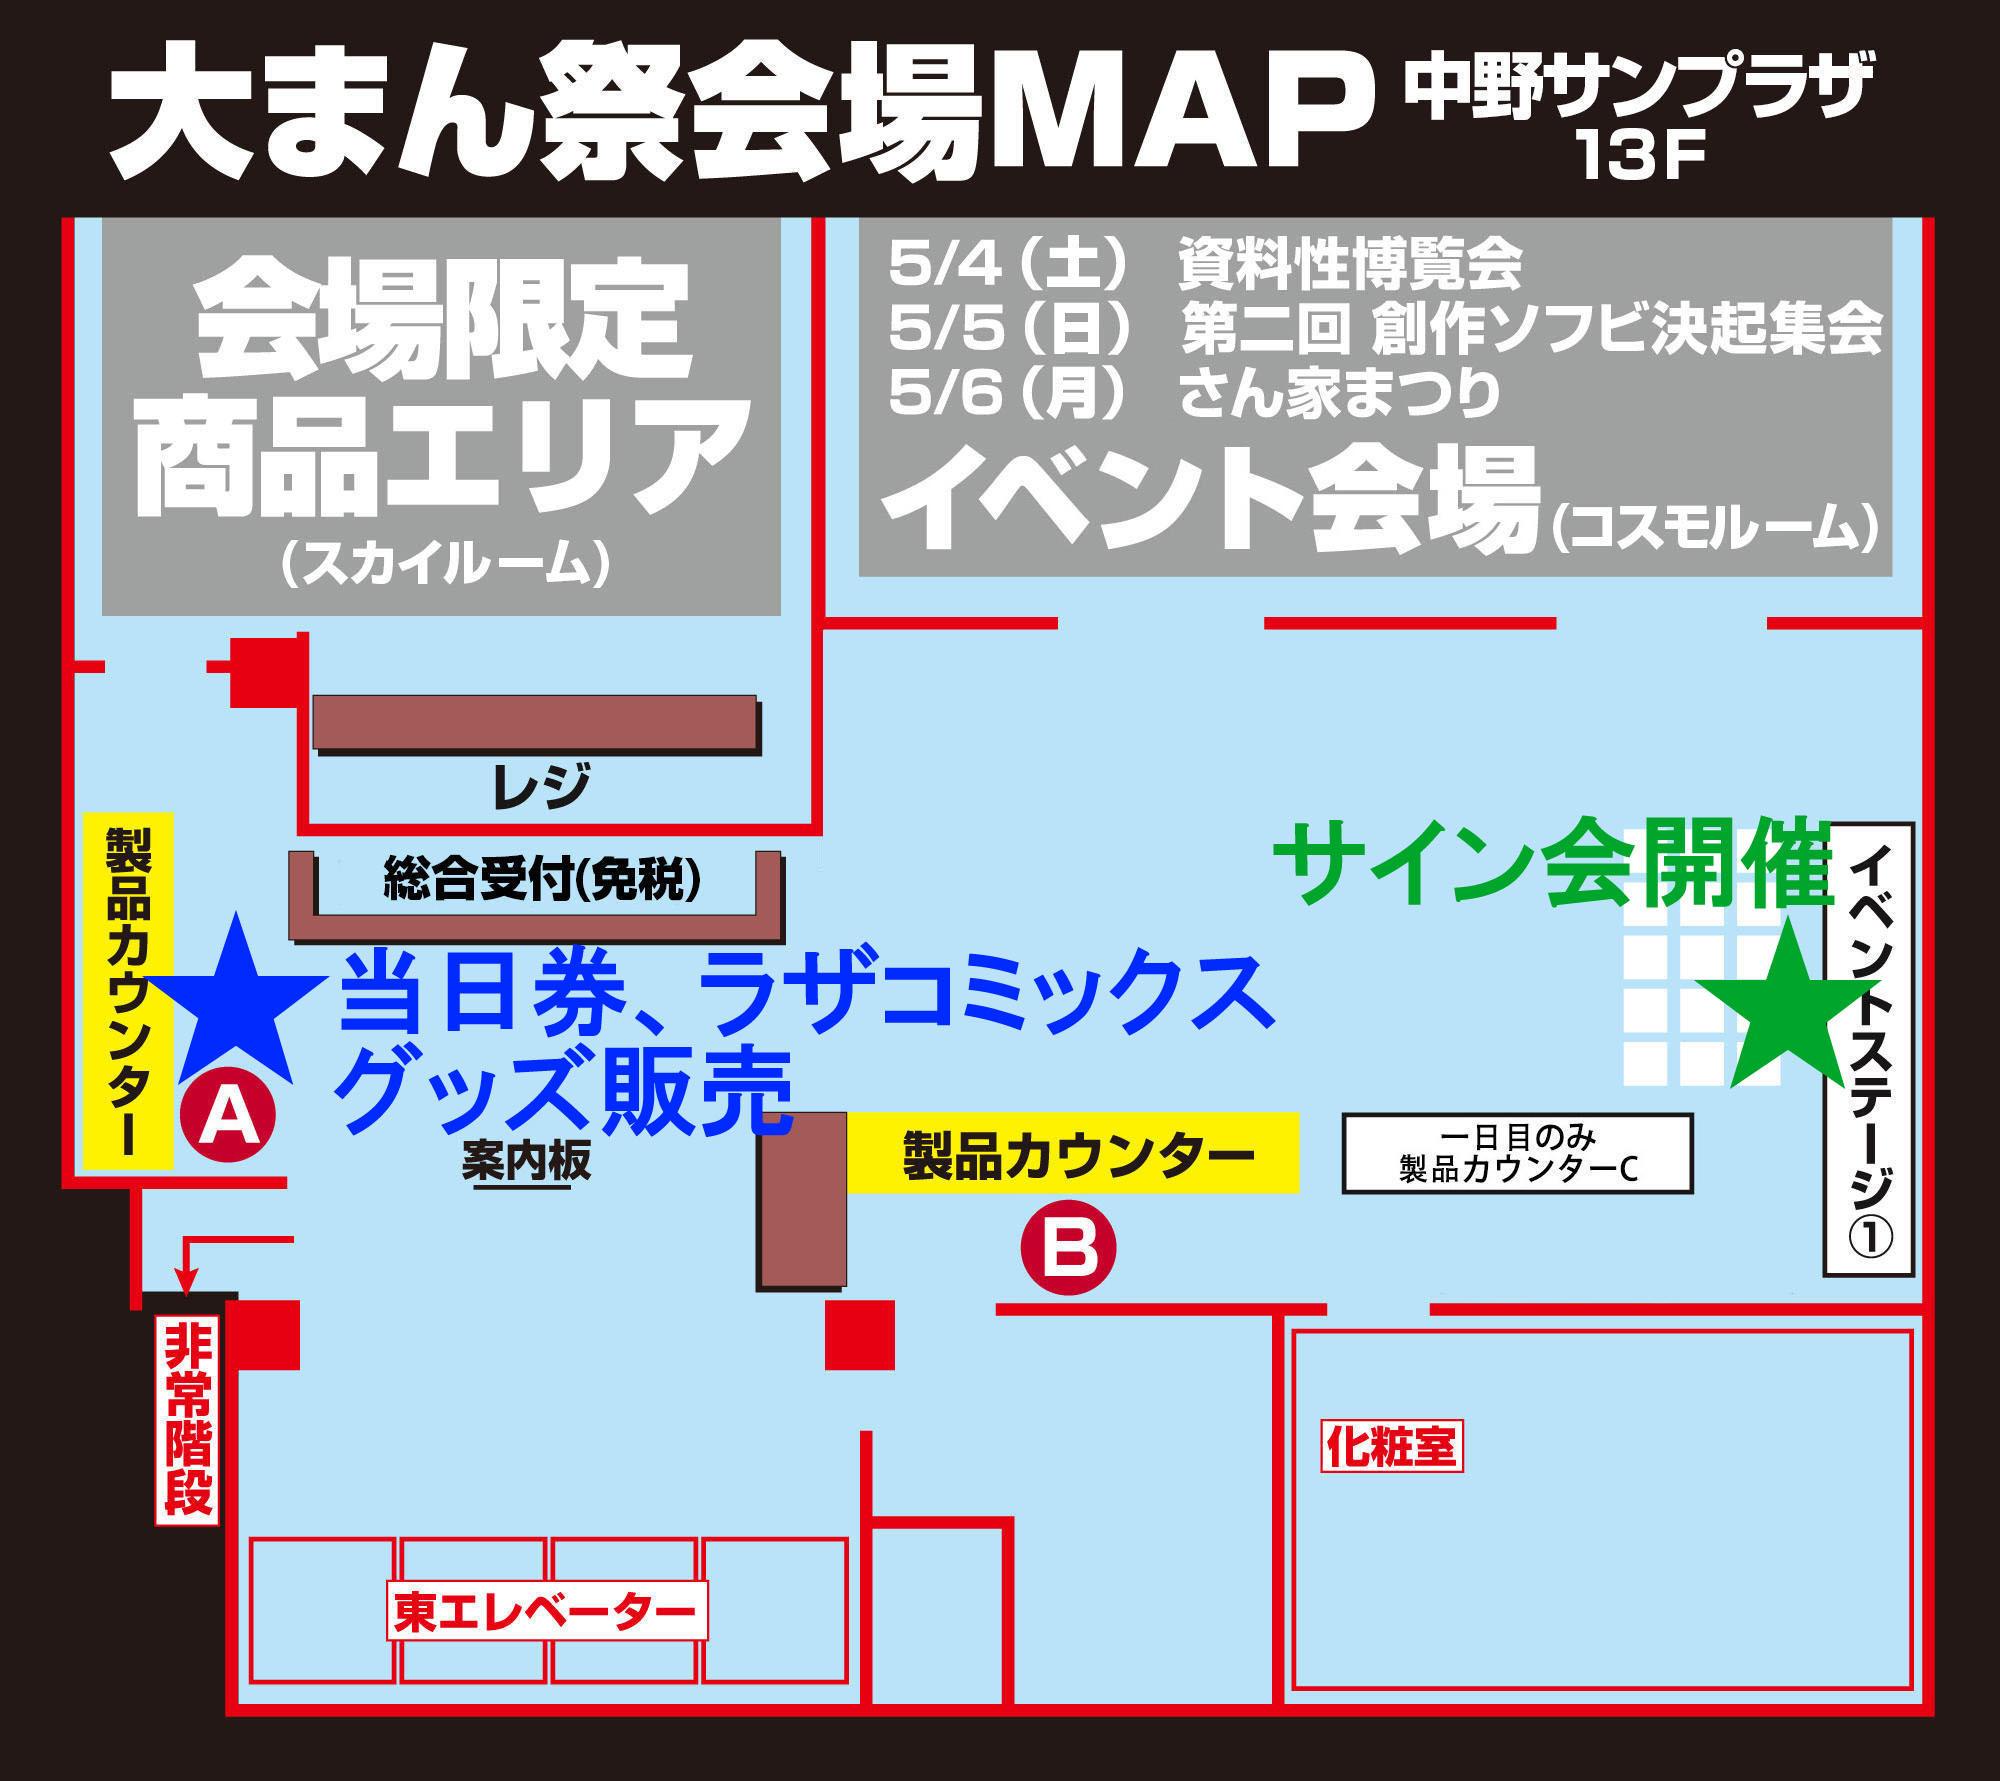 kaijyo_map.jpg